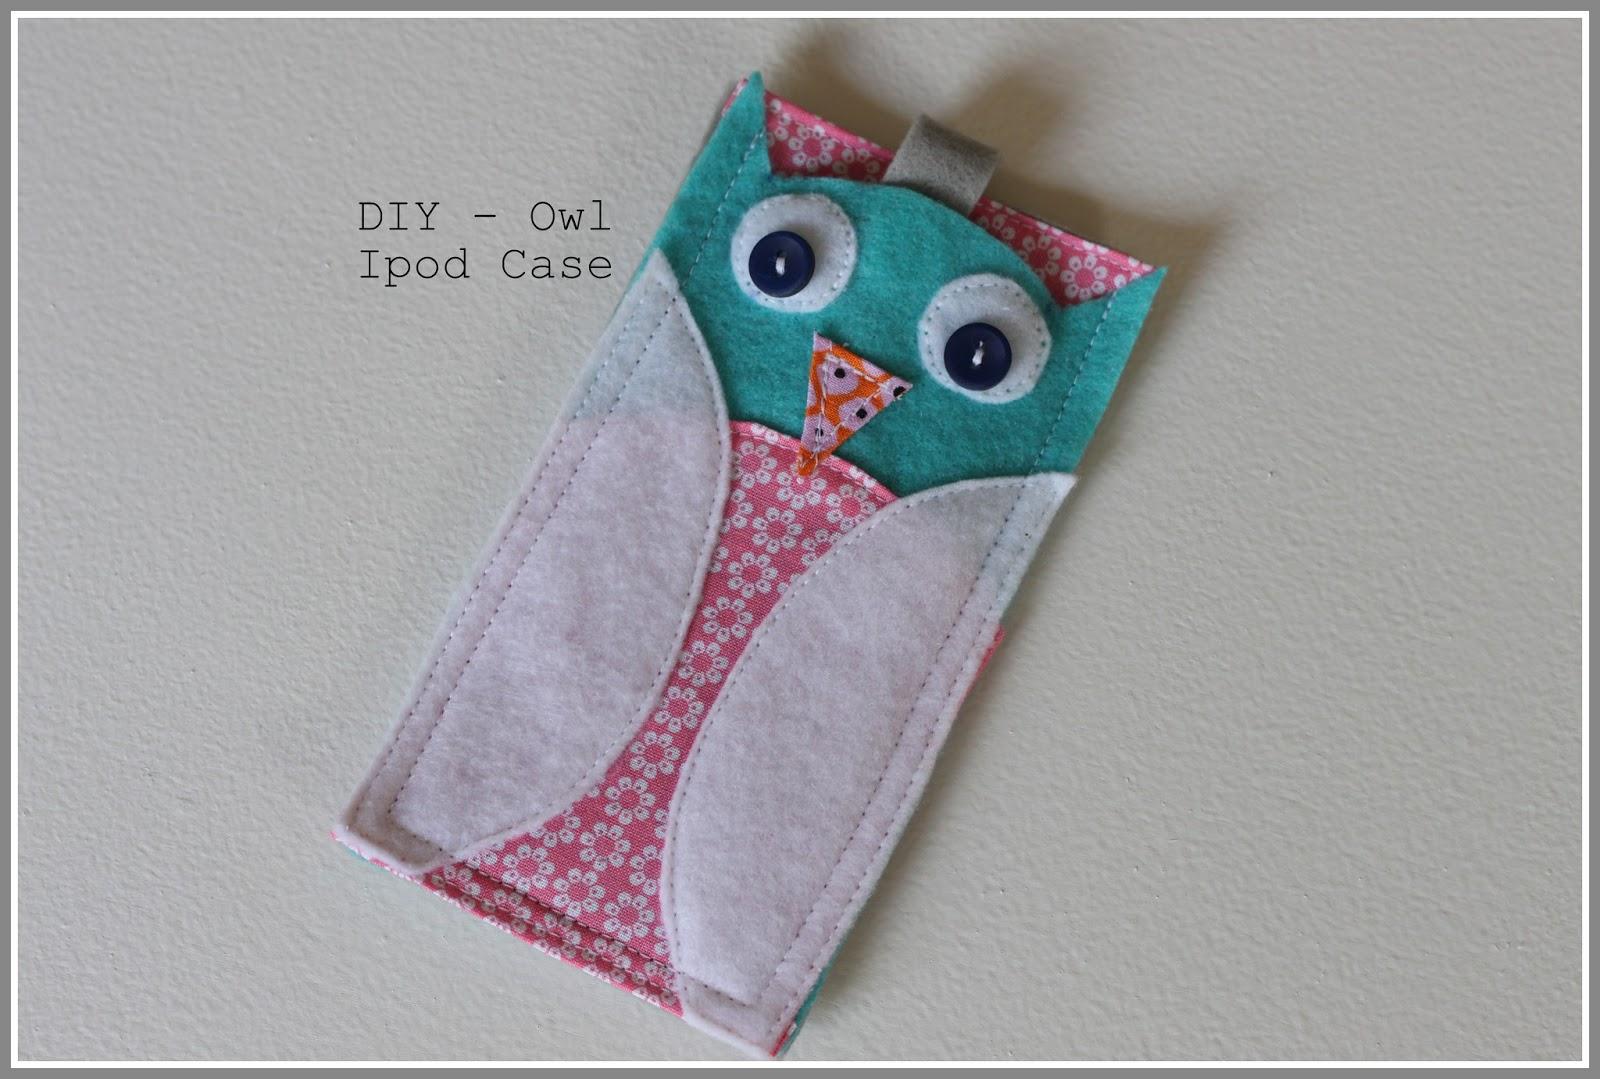 Adhesivo De Montaje Agorex ~ Tutorial Owl Case For iPod Touch Handmade Frenzy